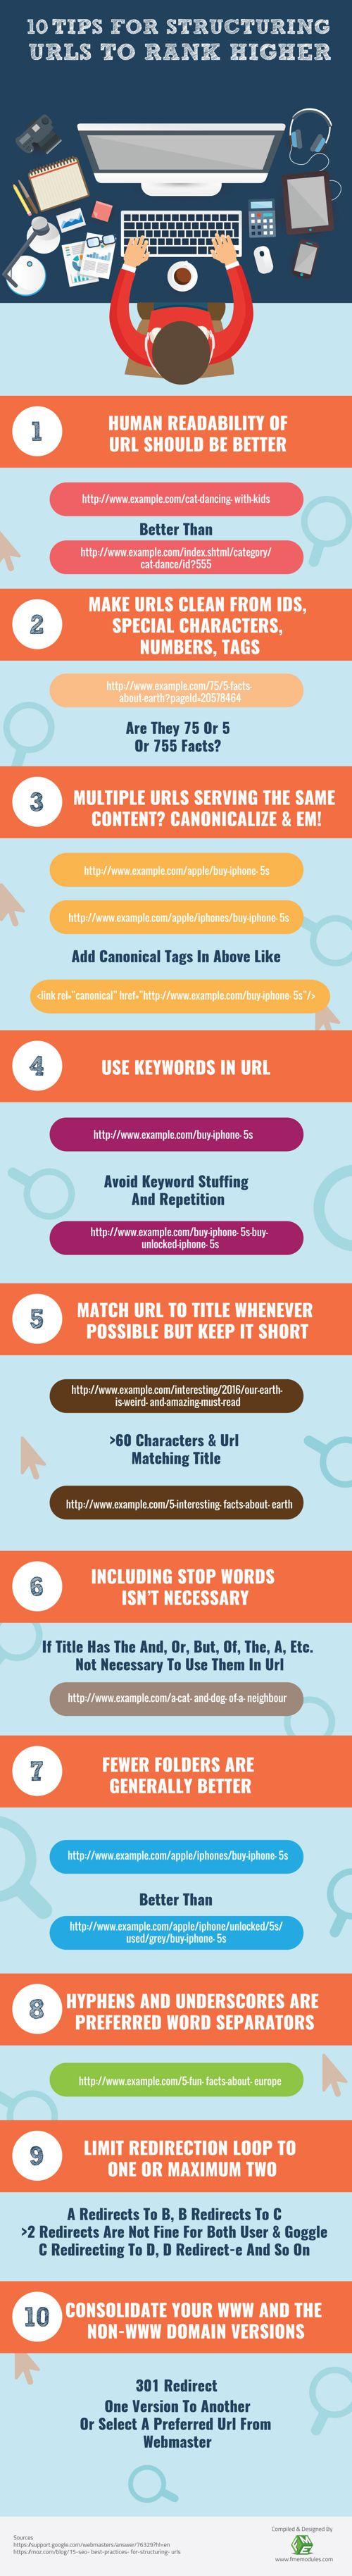 consejos-estructurar-urls-infografia